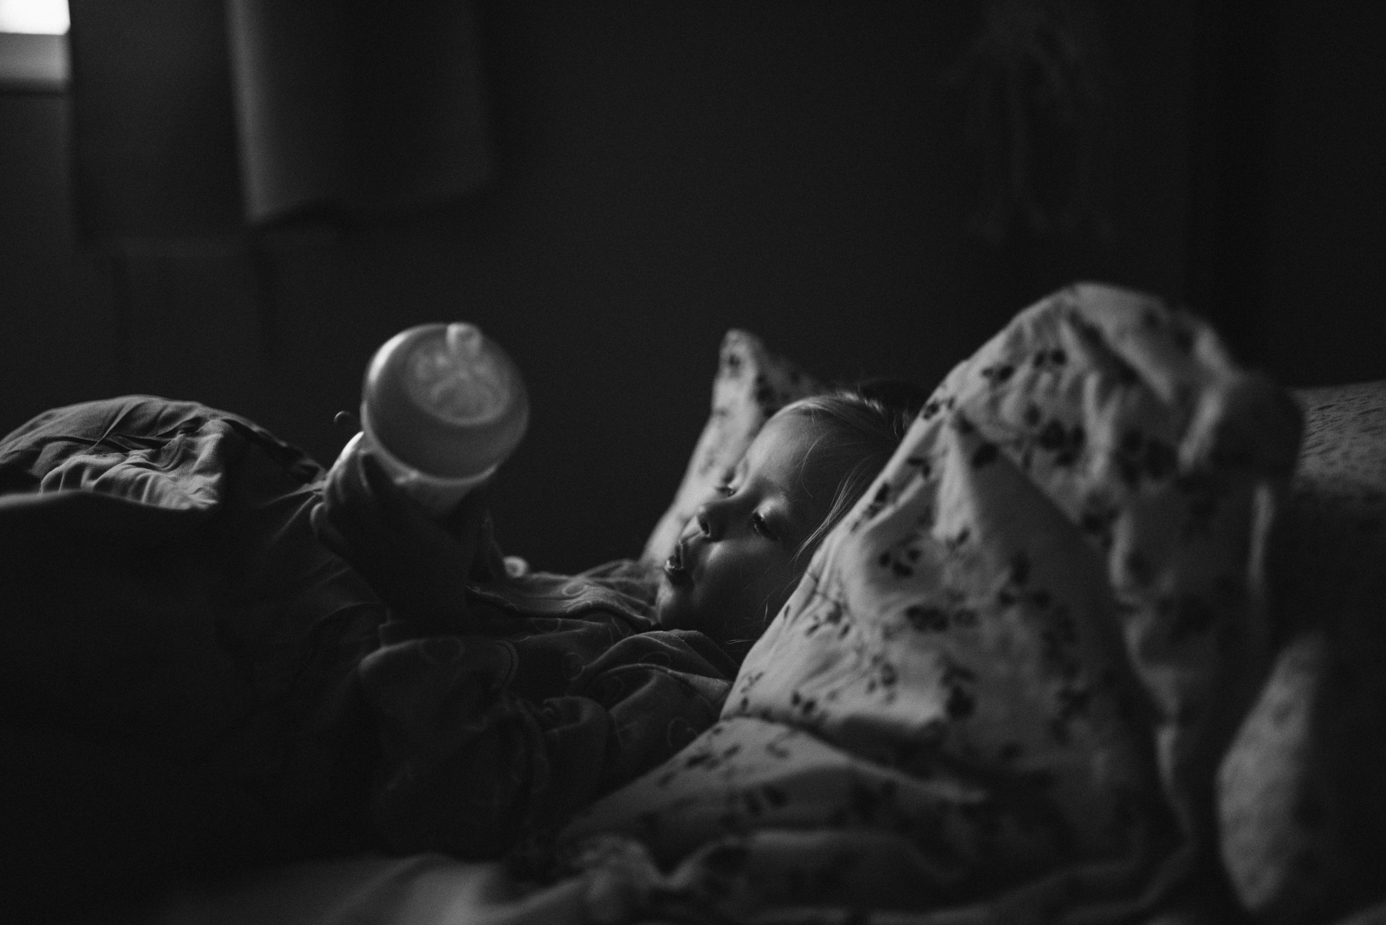 st. albert photographer, Jessica Leanne Photography, lifestyle portrait